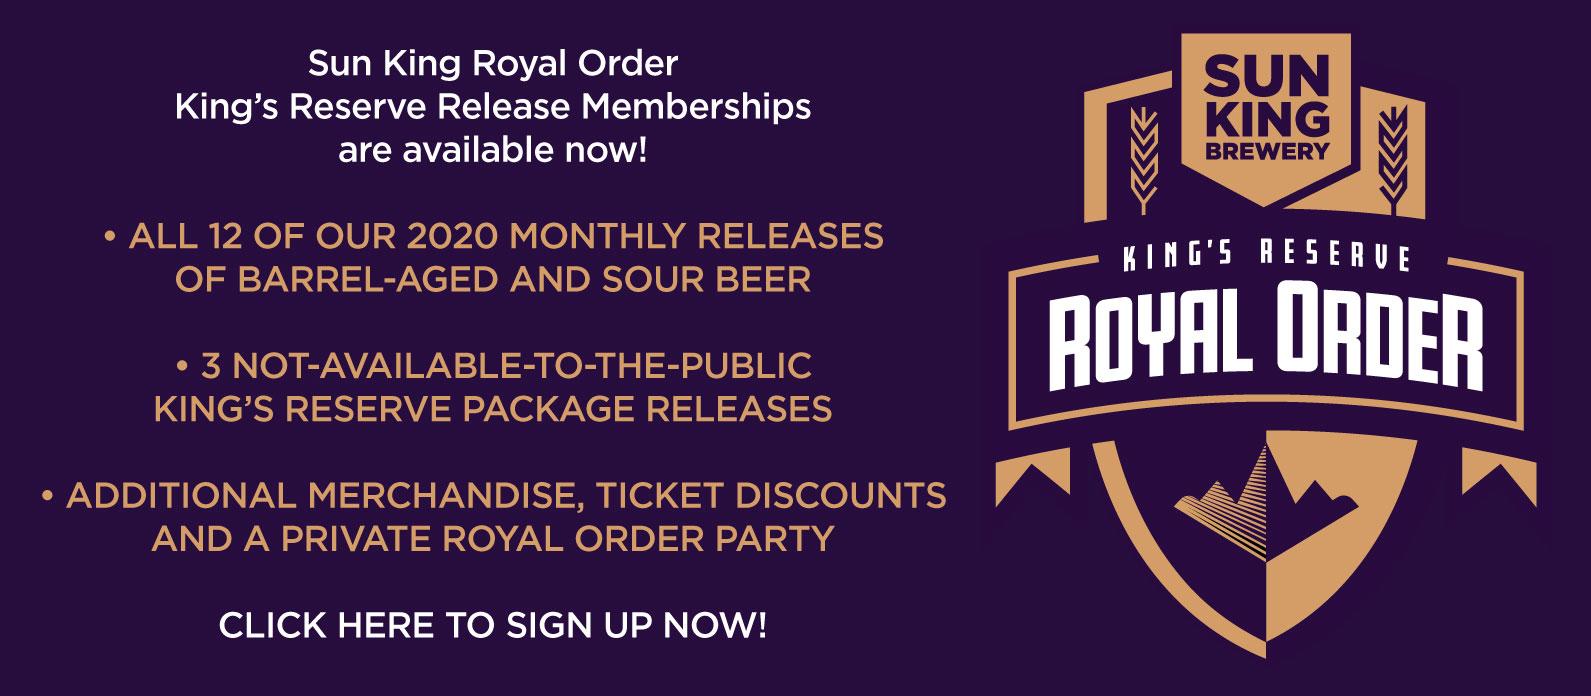 RoyalOrder2020